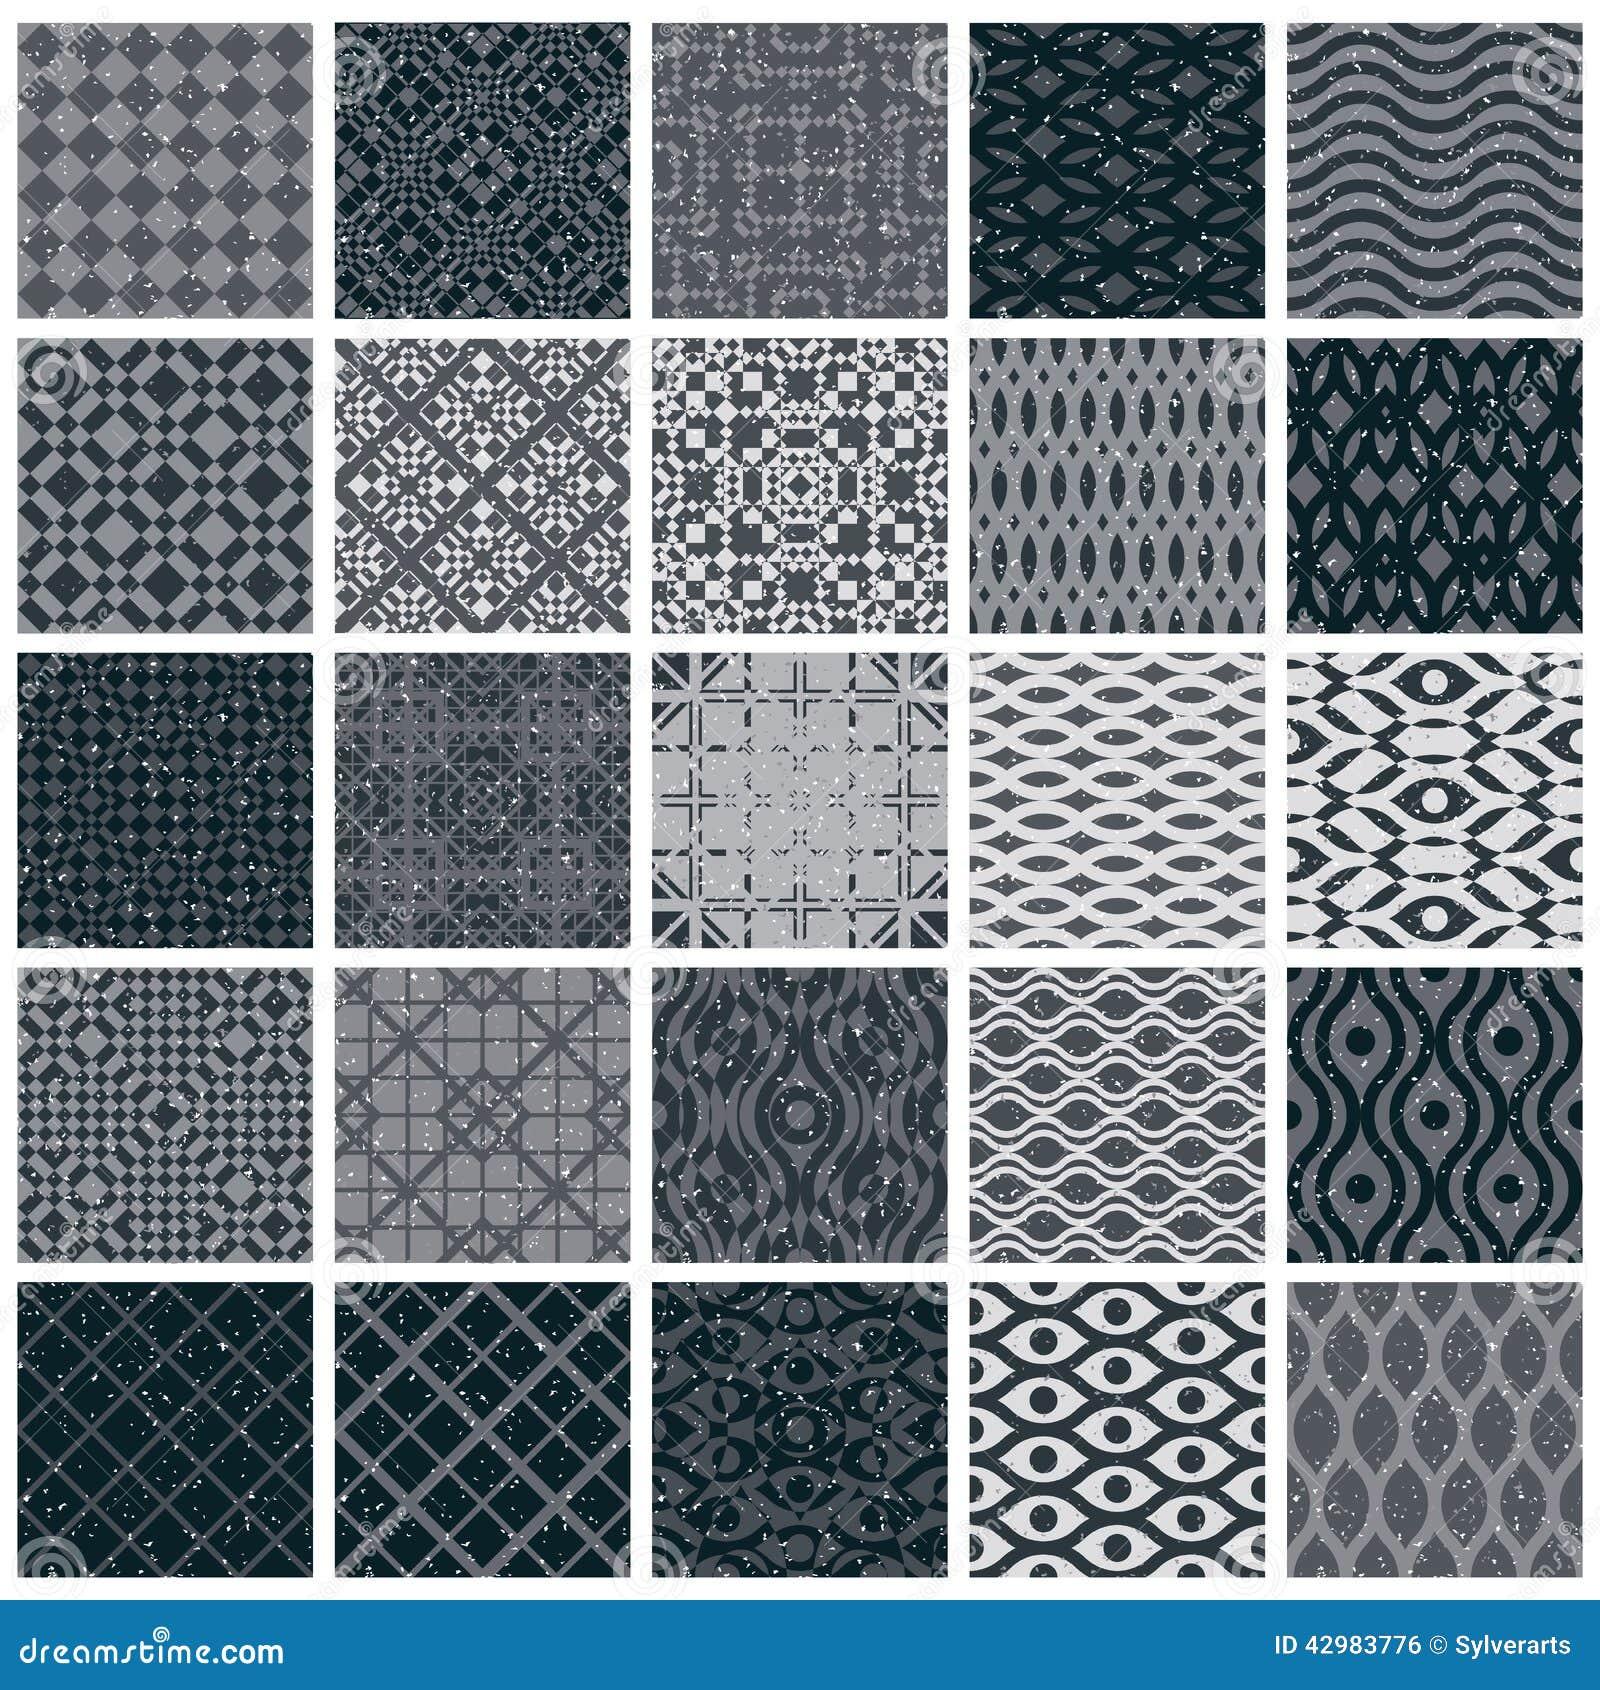 beste kwaliteit zwart wit tegelvloer inspirerende ideeà n ontwerp